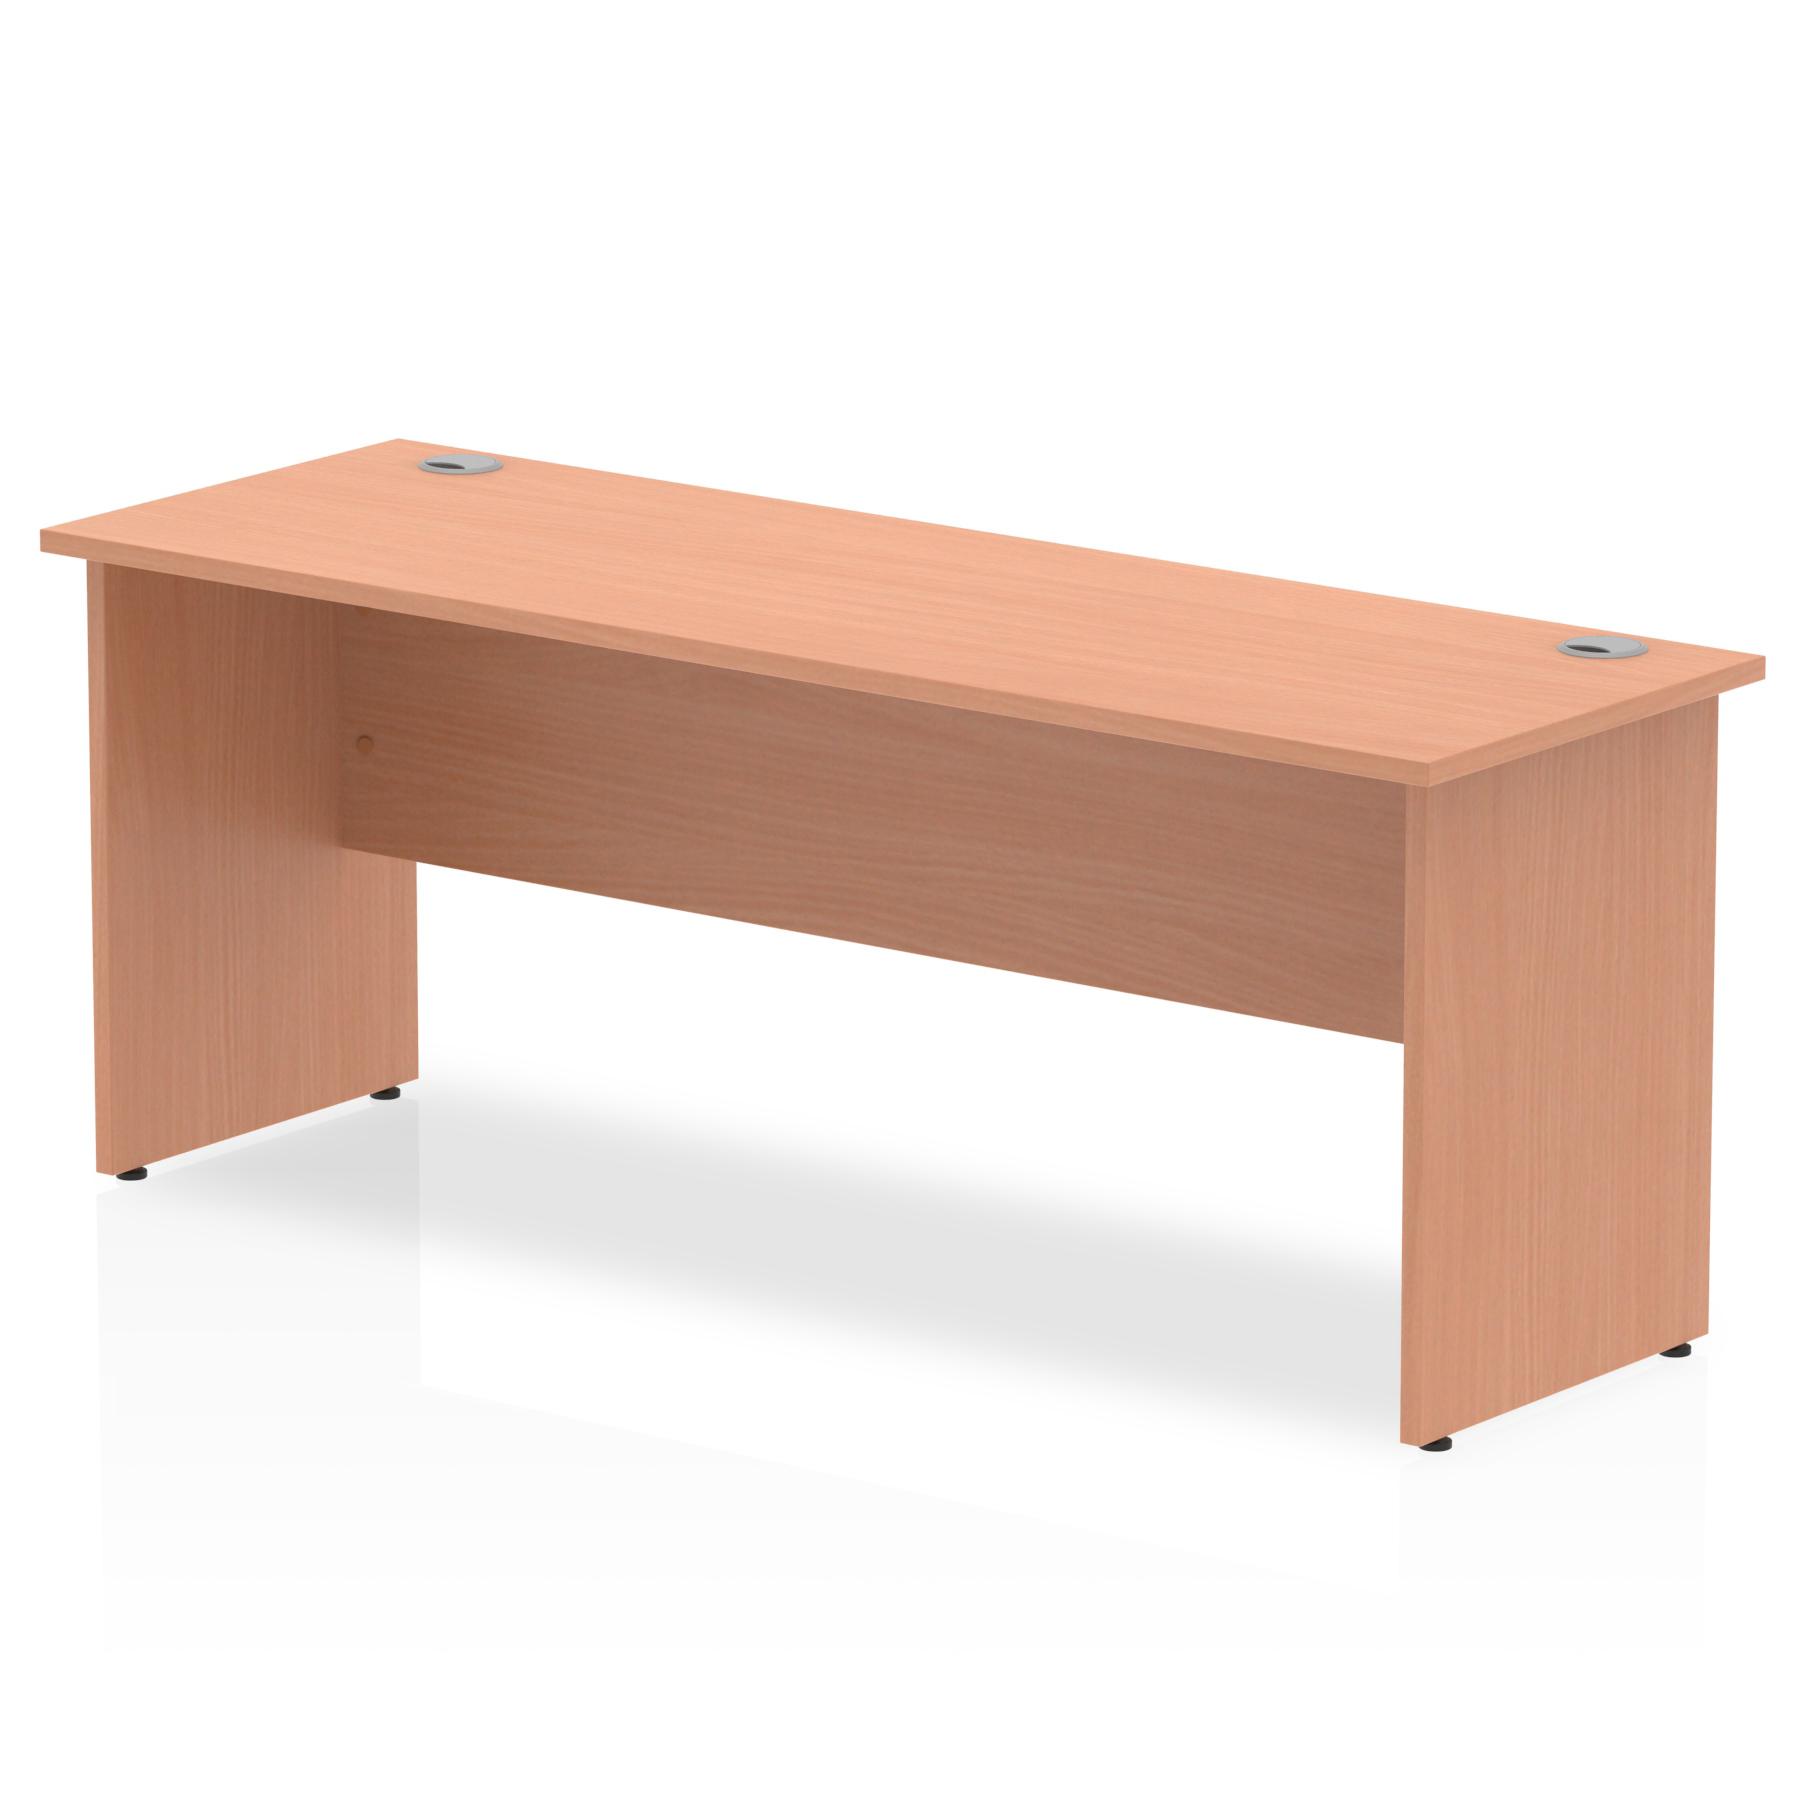 Trexus Desk Rectangle Panel End Leg 1800x600mm Beech Ref MI001732